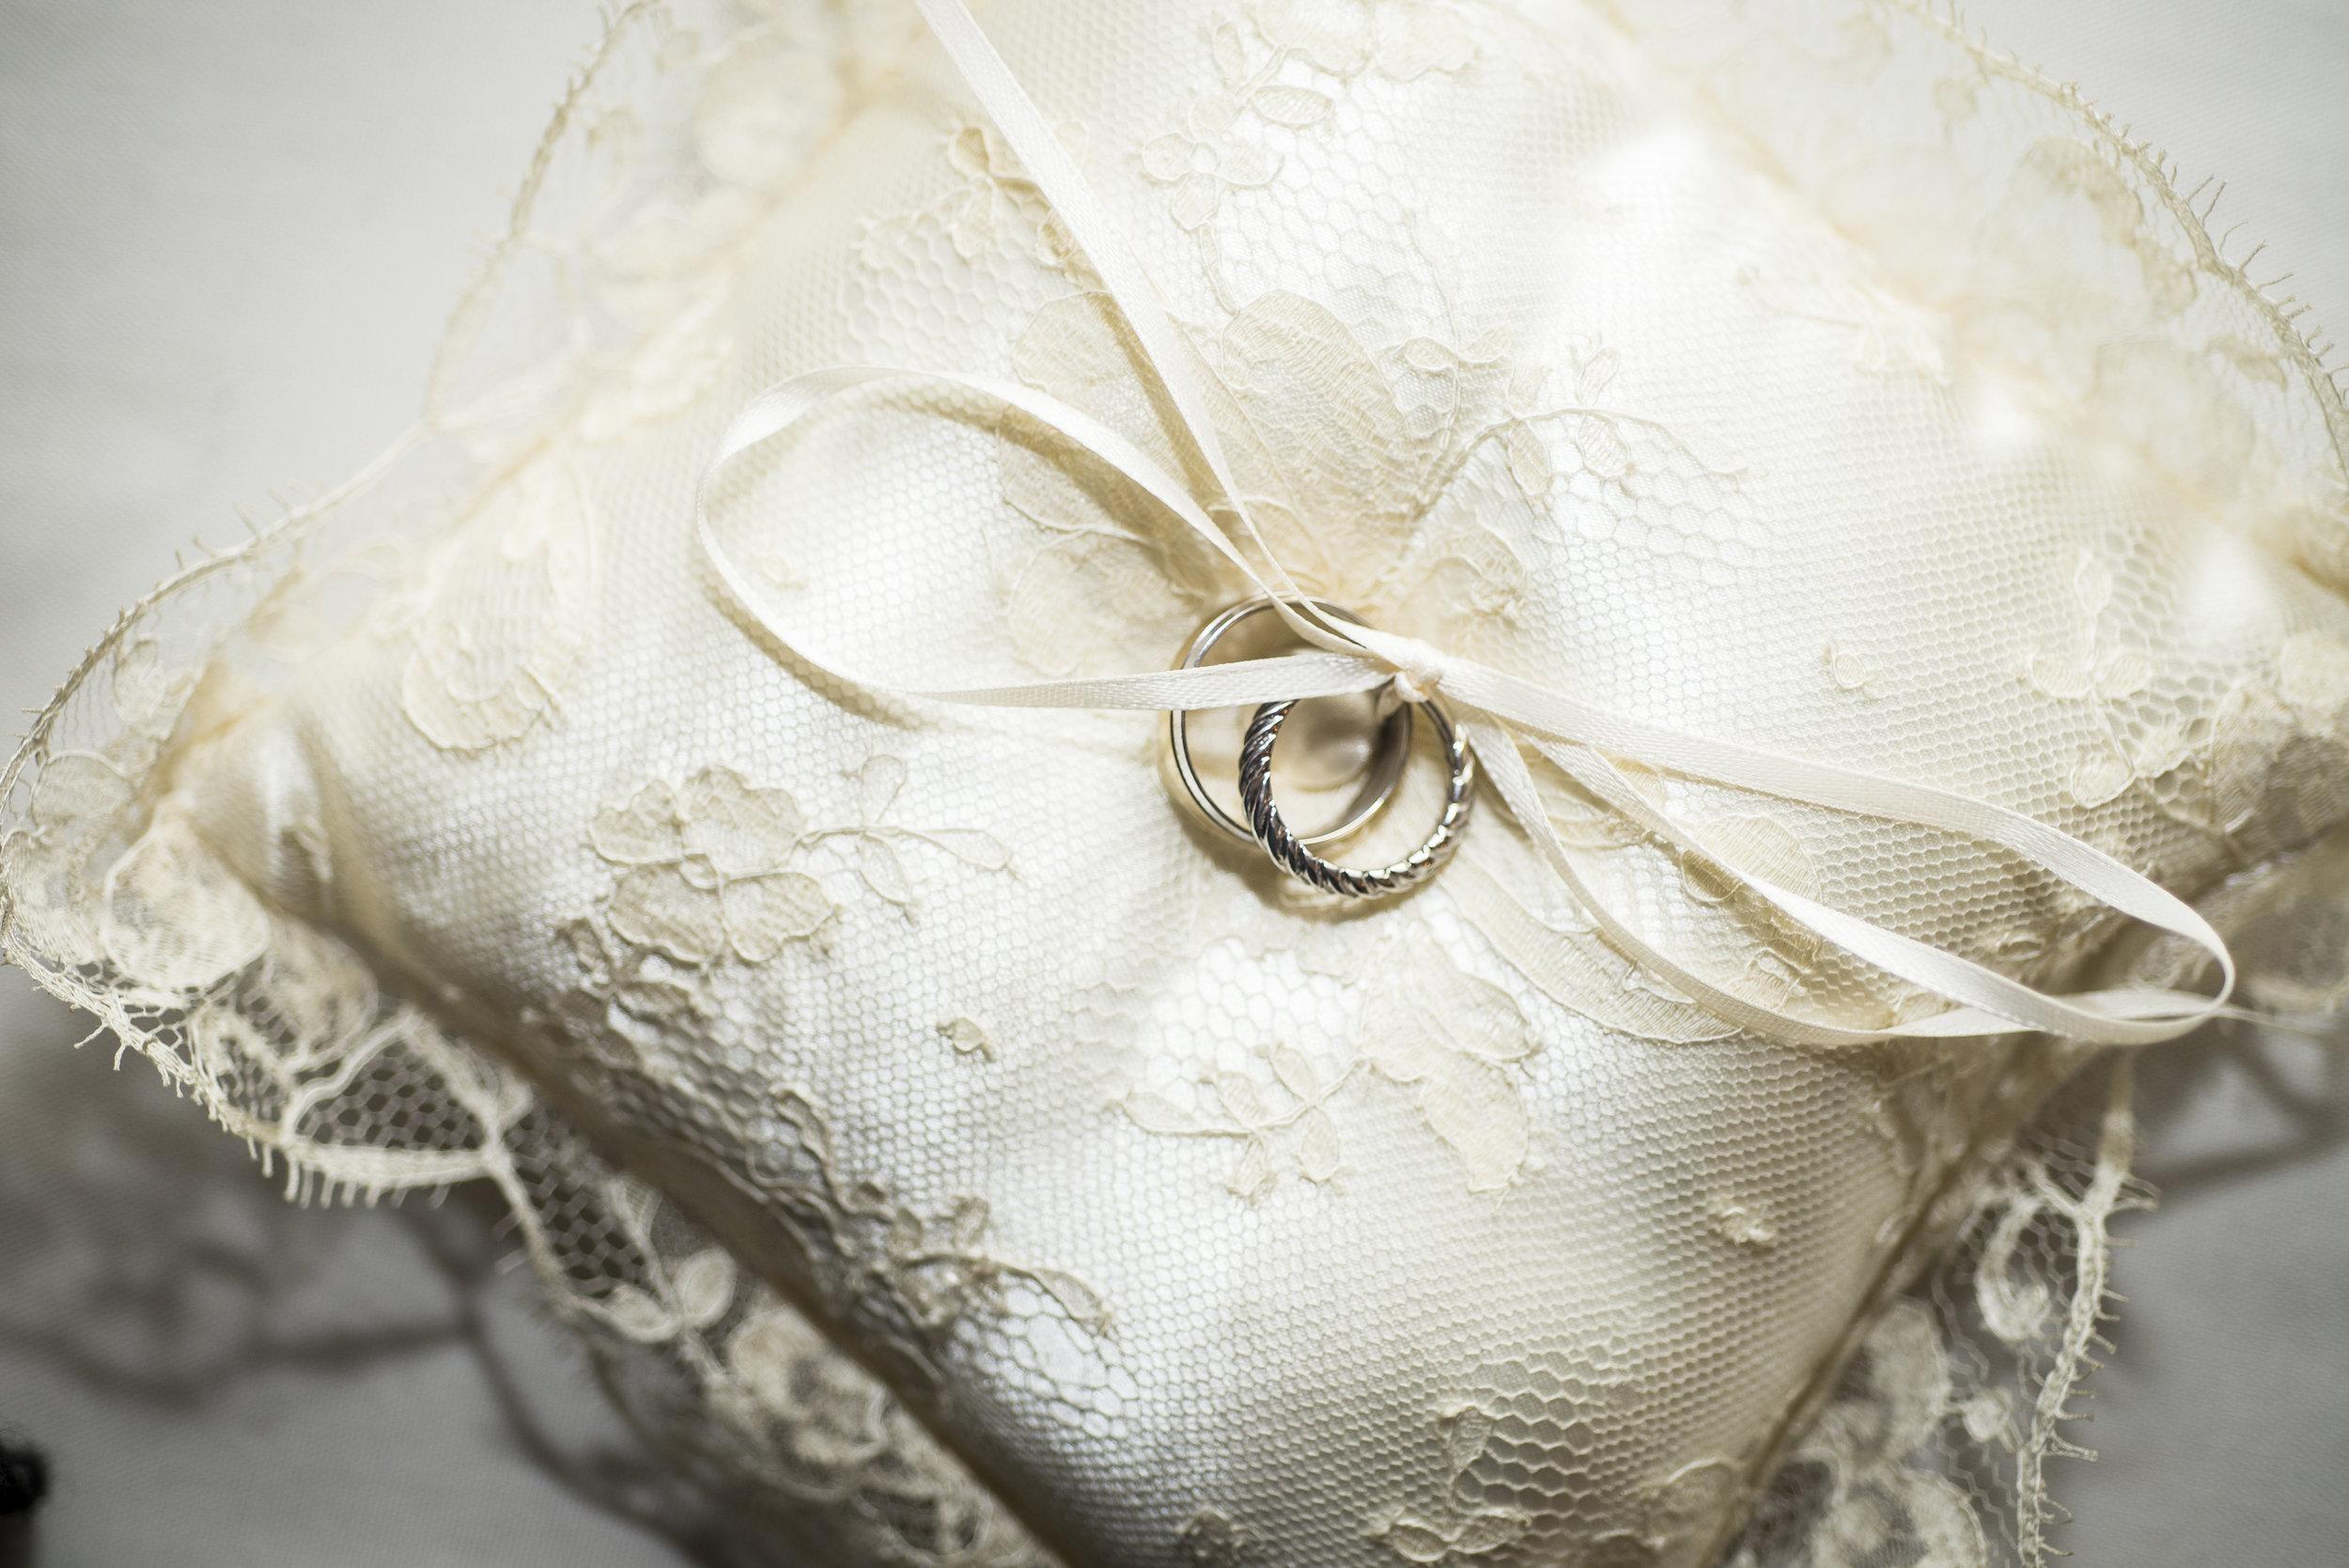 Winter wedding ring bearer pillow // The Miner Details weddings